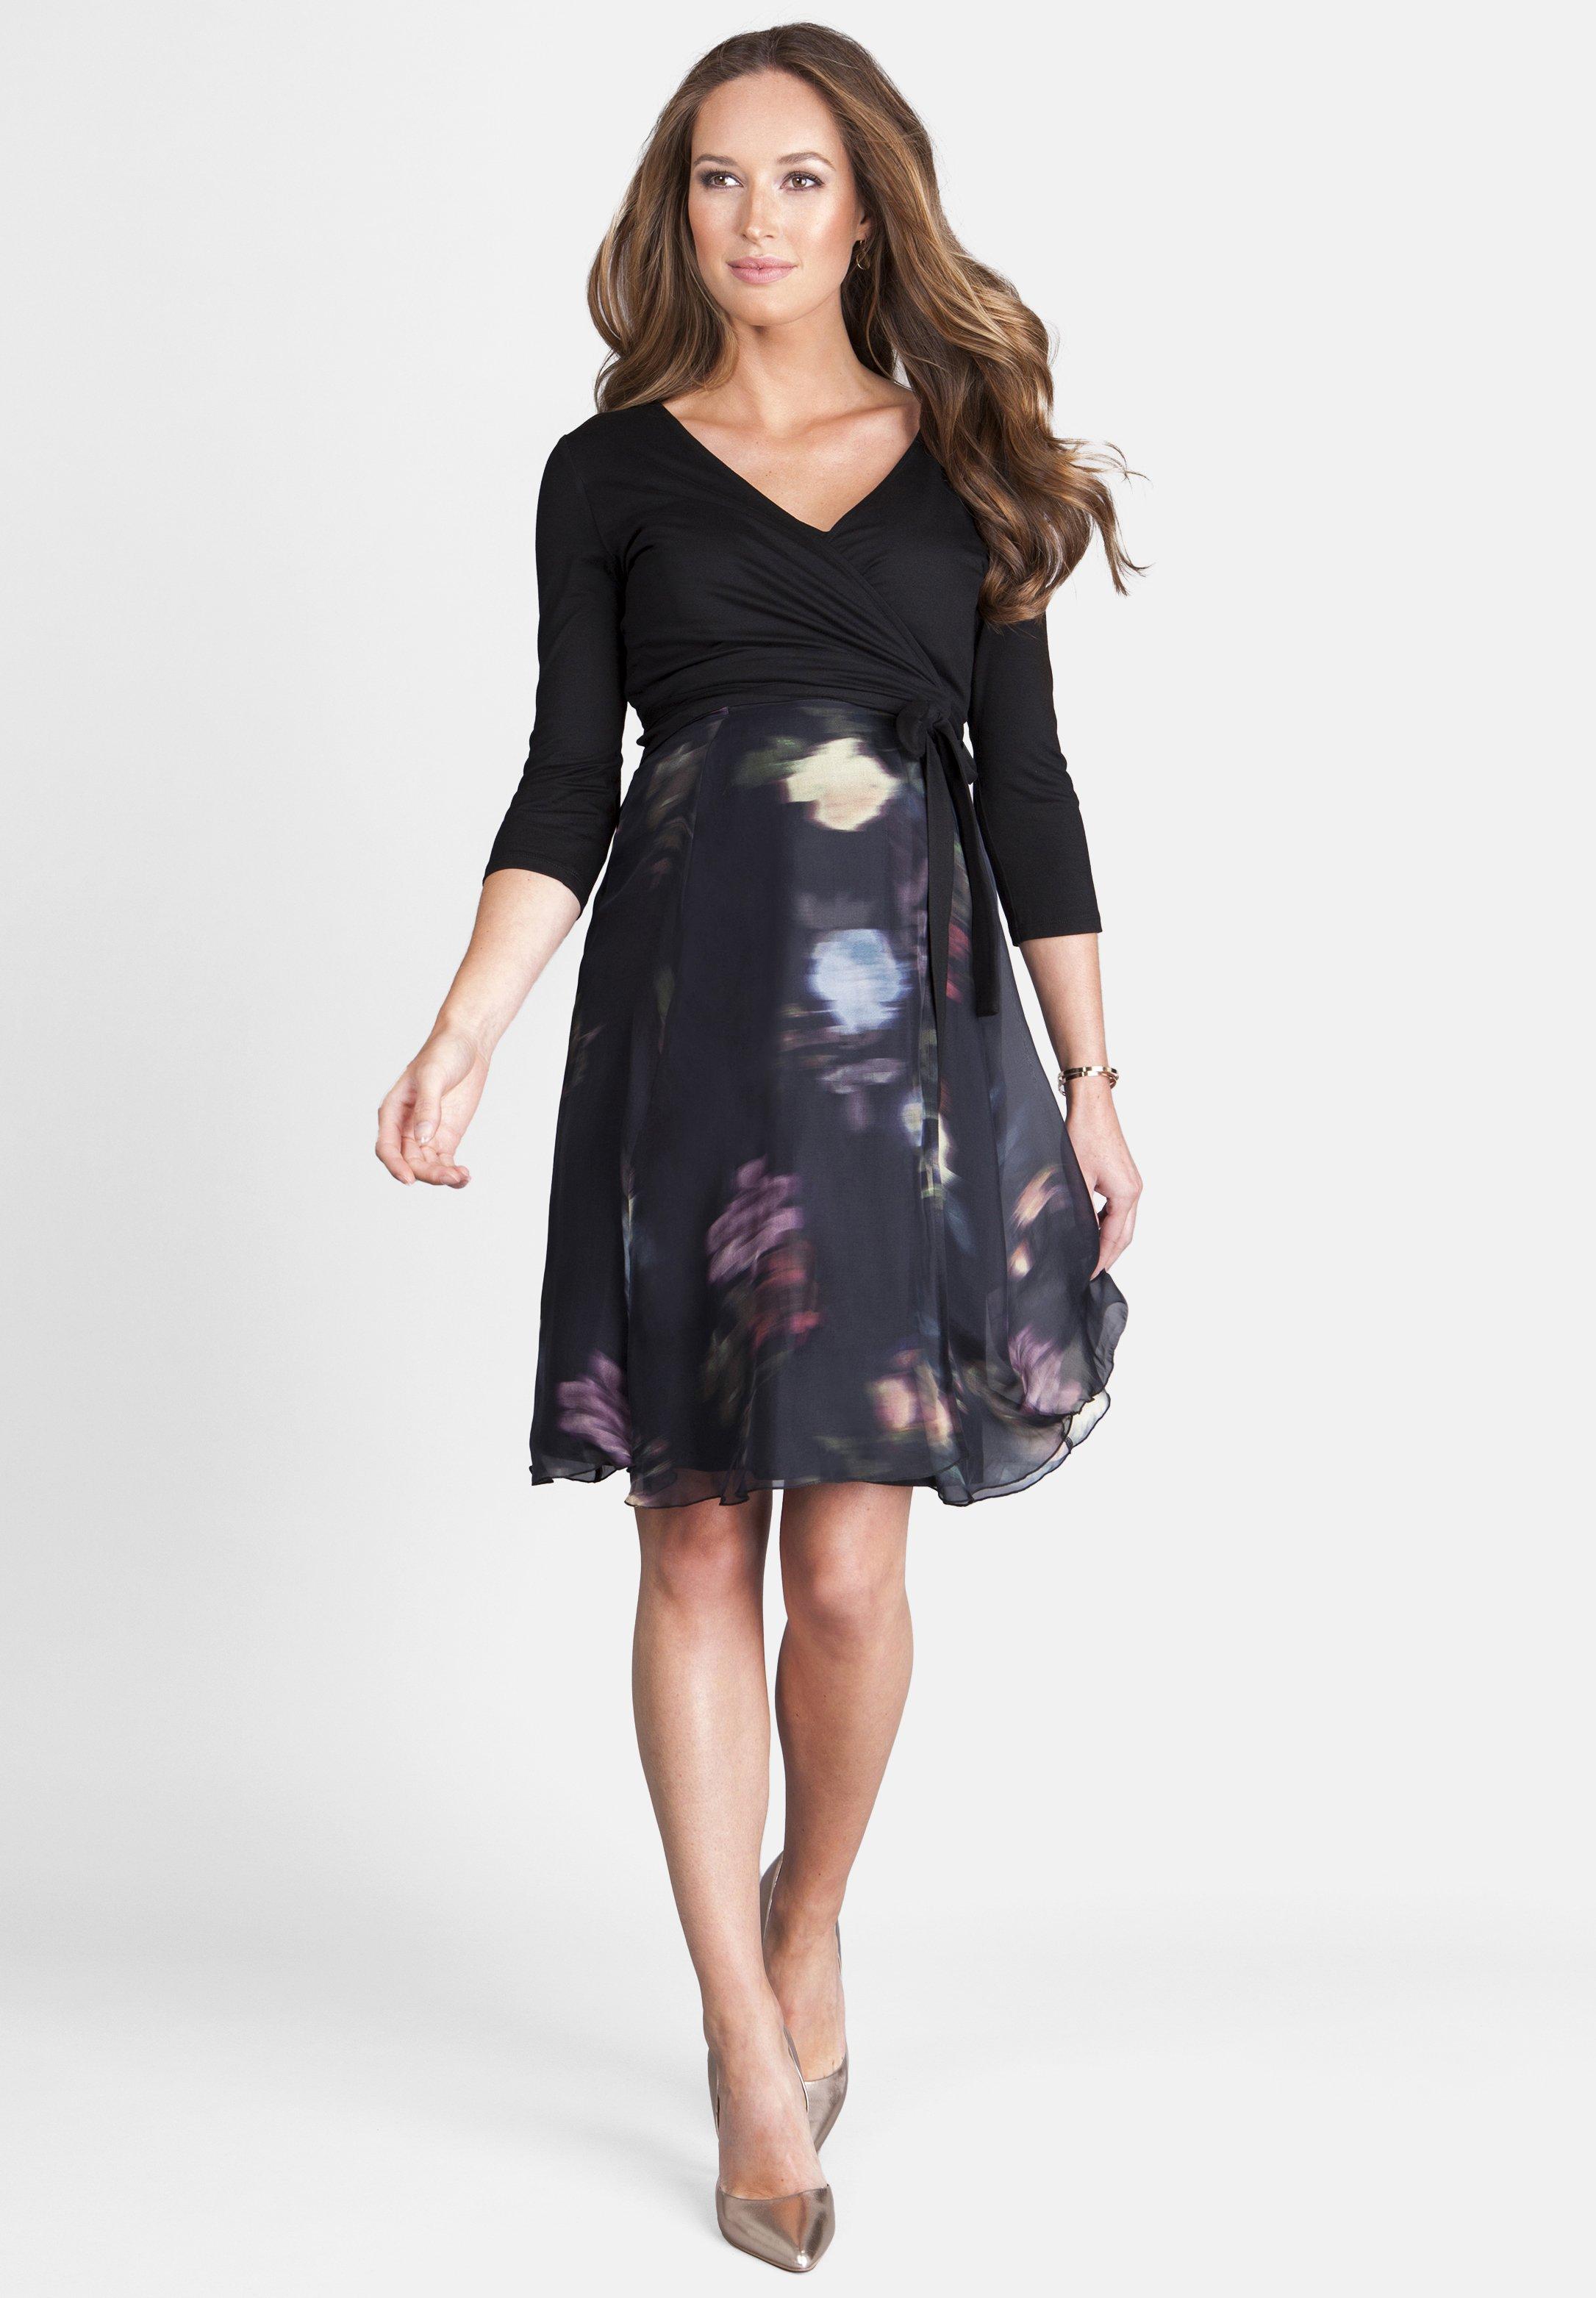 Damen MATERNITY & NURSING BLACK FLORAL WRAP DRESS - Freizeitkleid